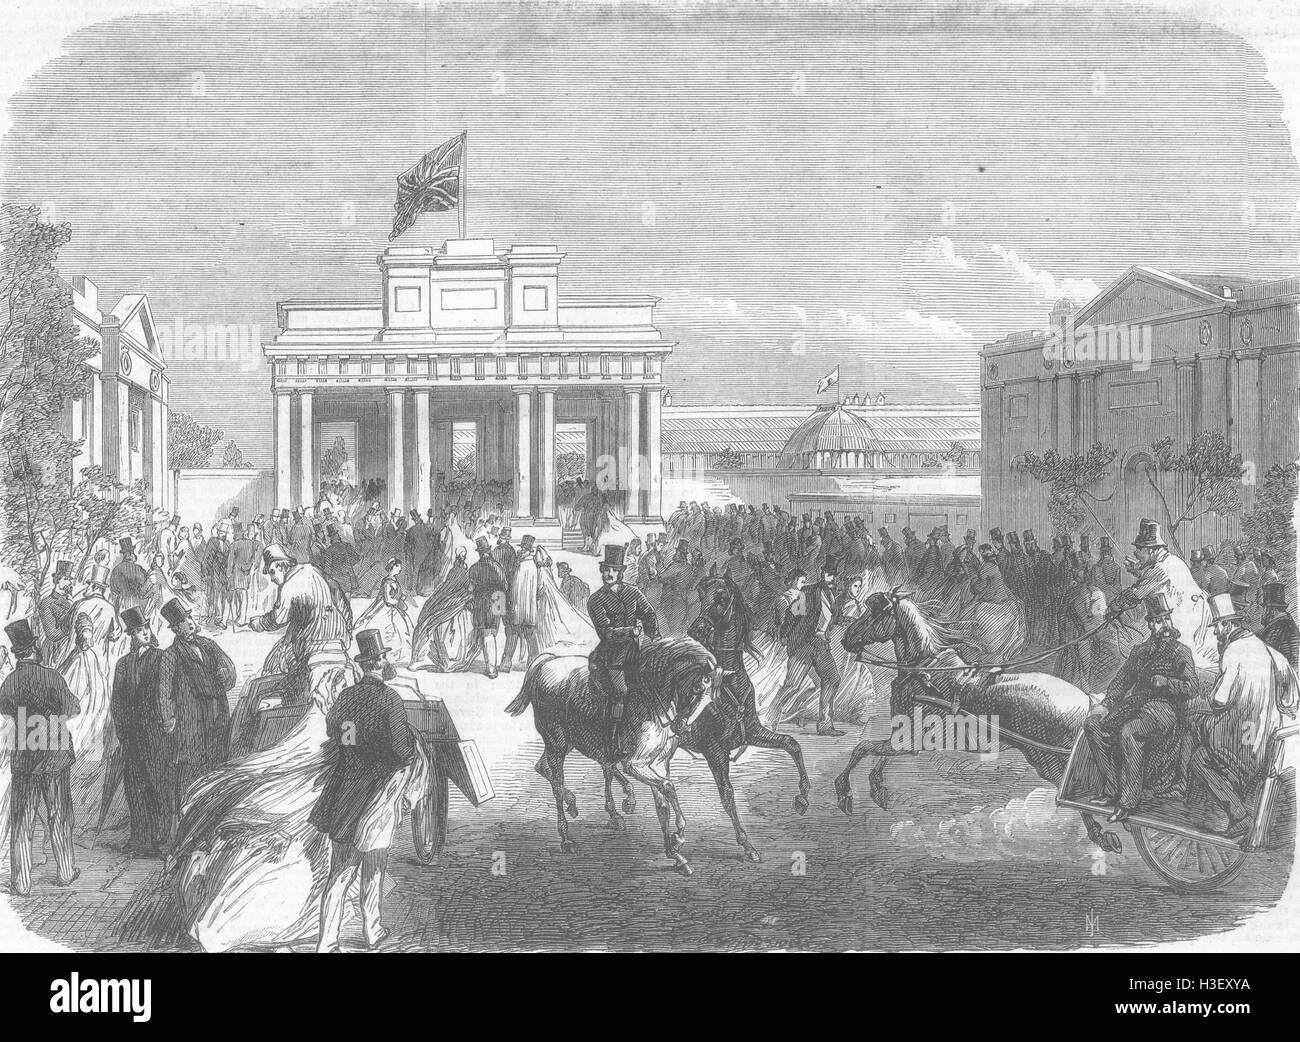 IRELAND The Dublin Exhibition West entrance 1865. Illustrated London News - Stock Image